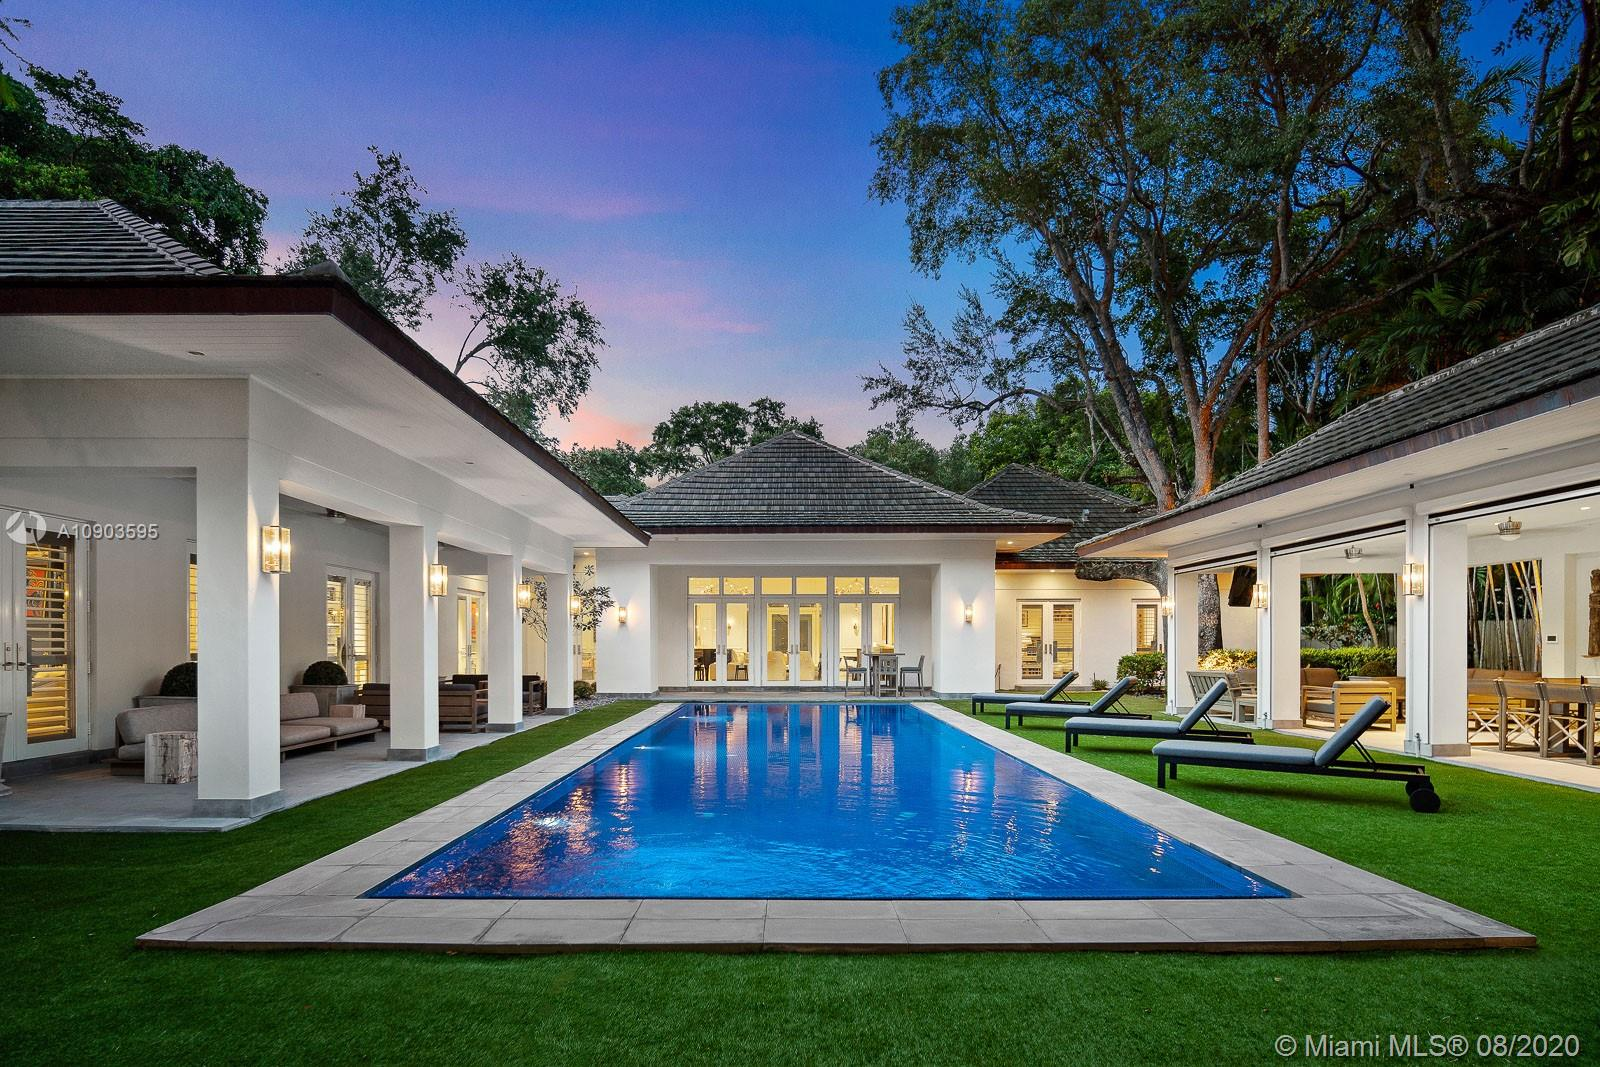 Real Estate Photo A10903595